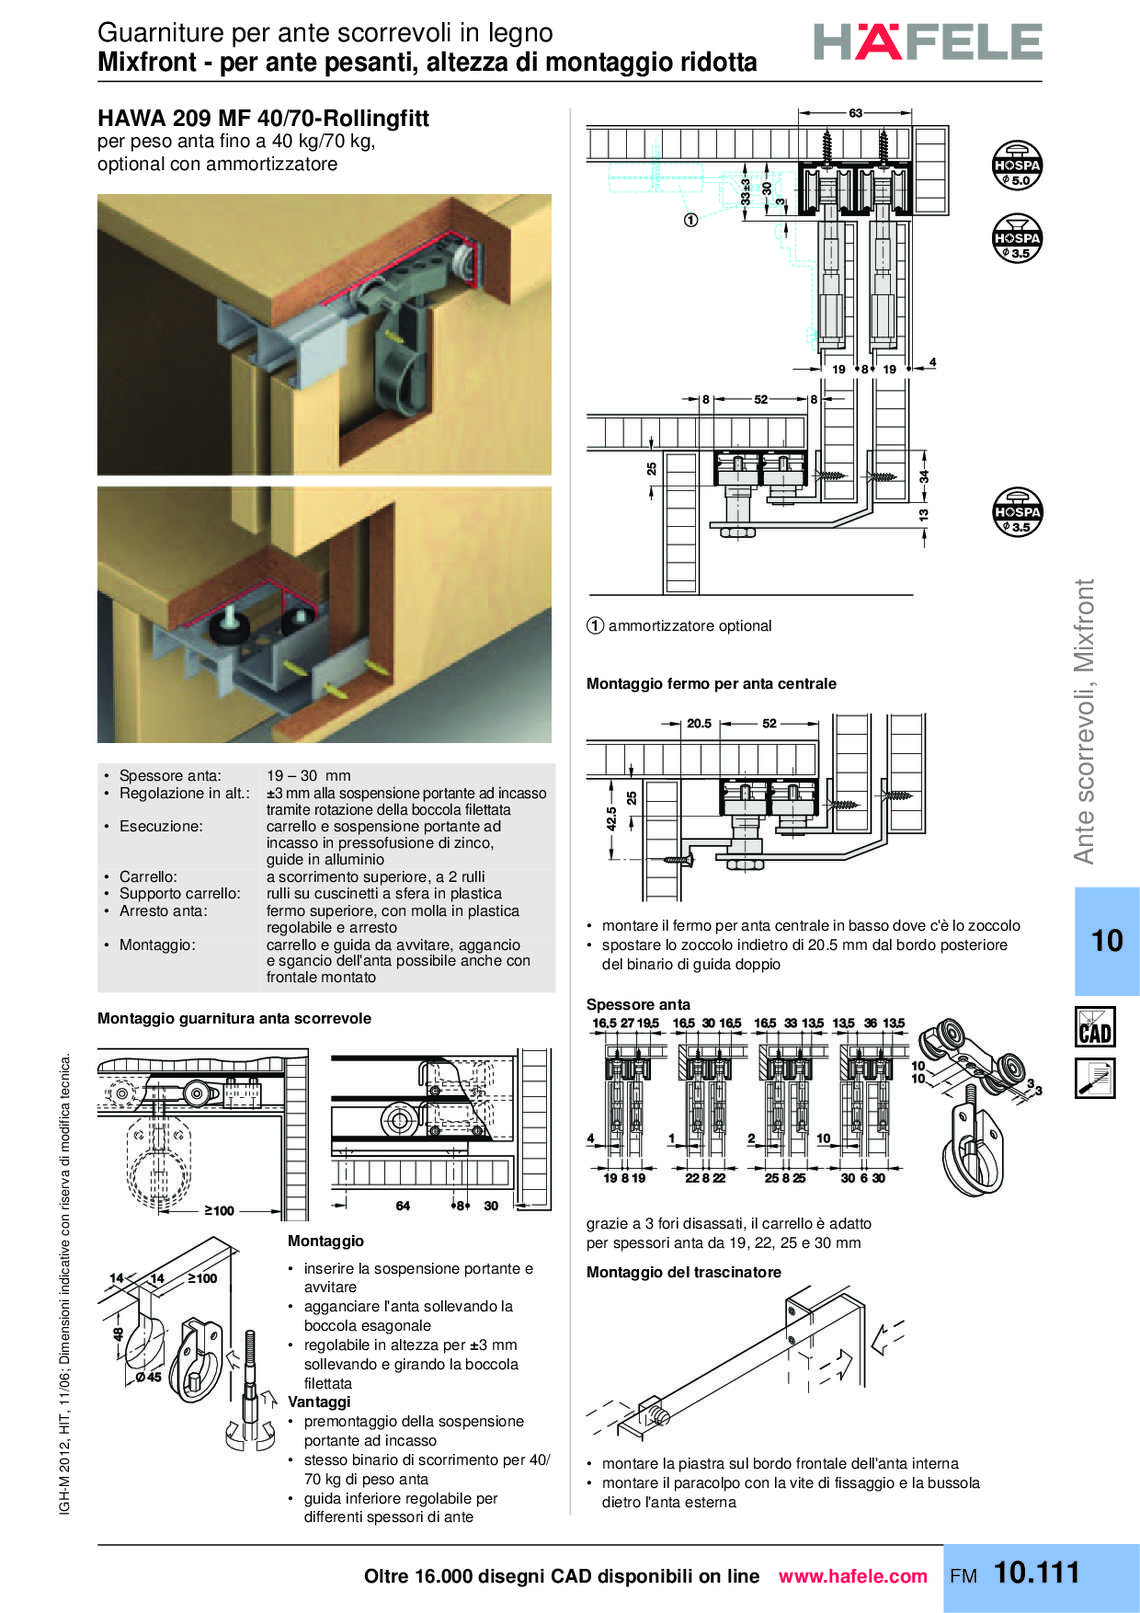 hafele-ante-scorrevoli-e-serrande_31_154.jpg